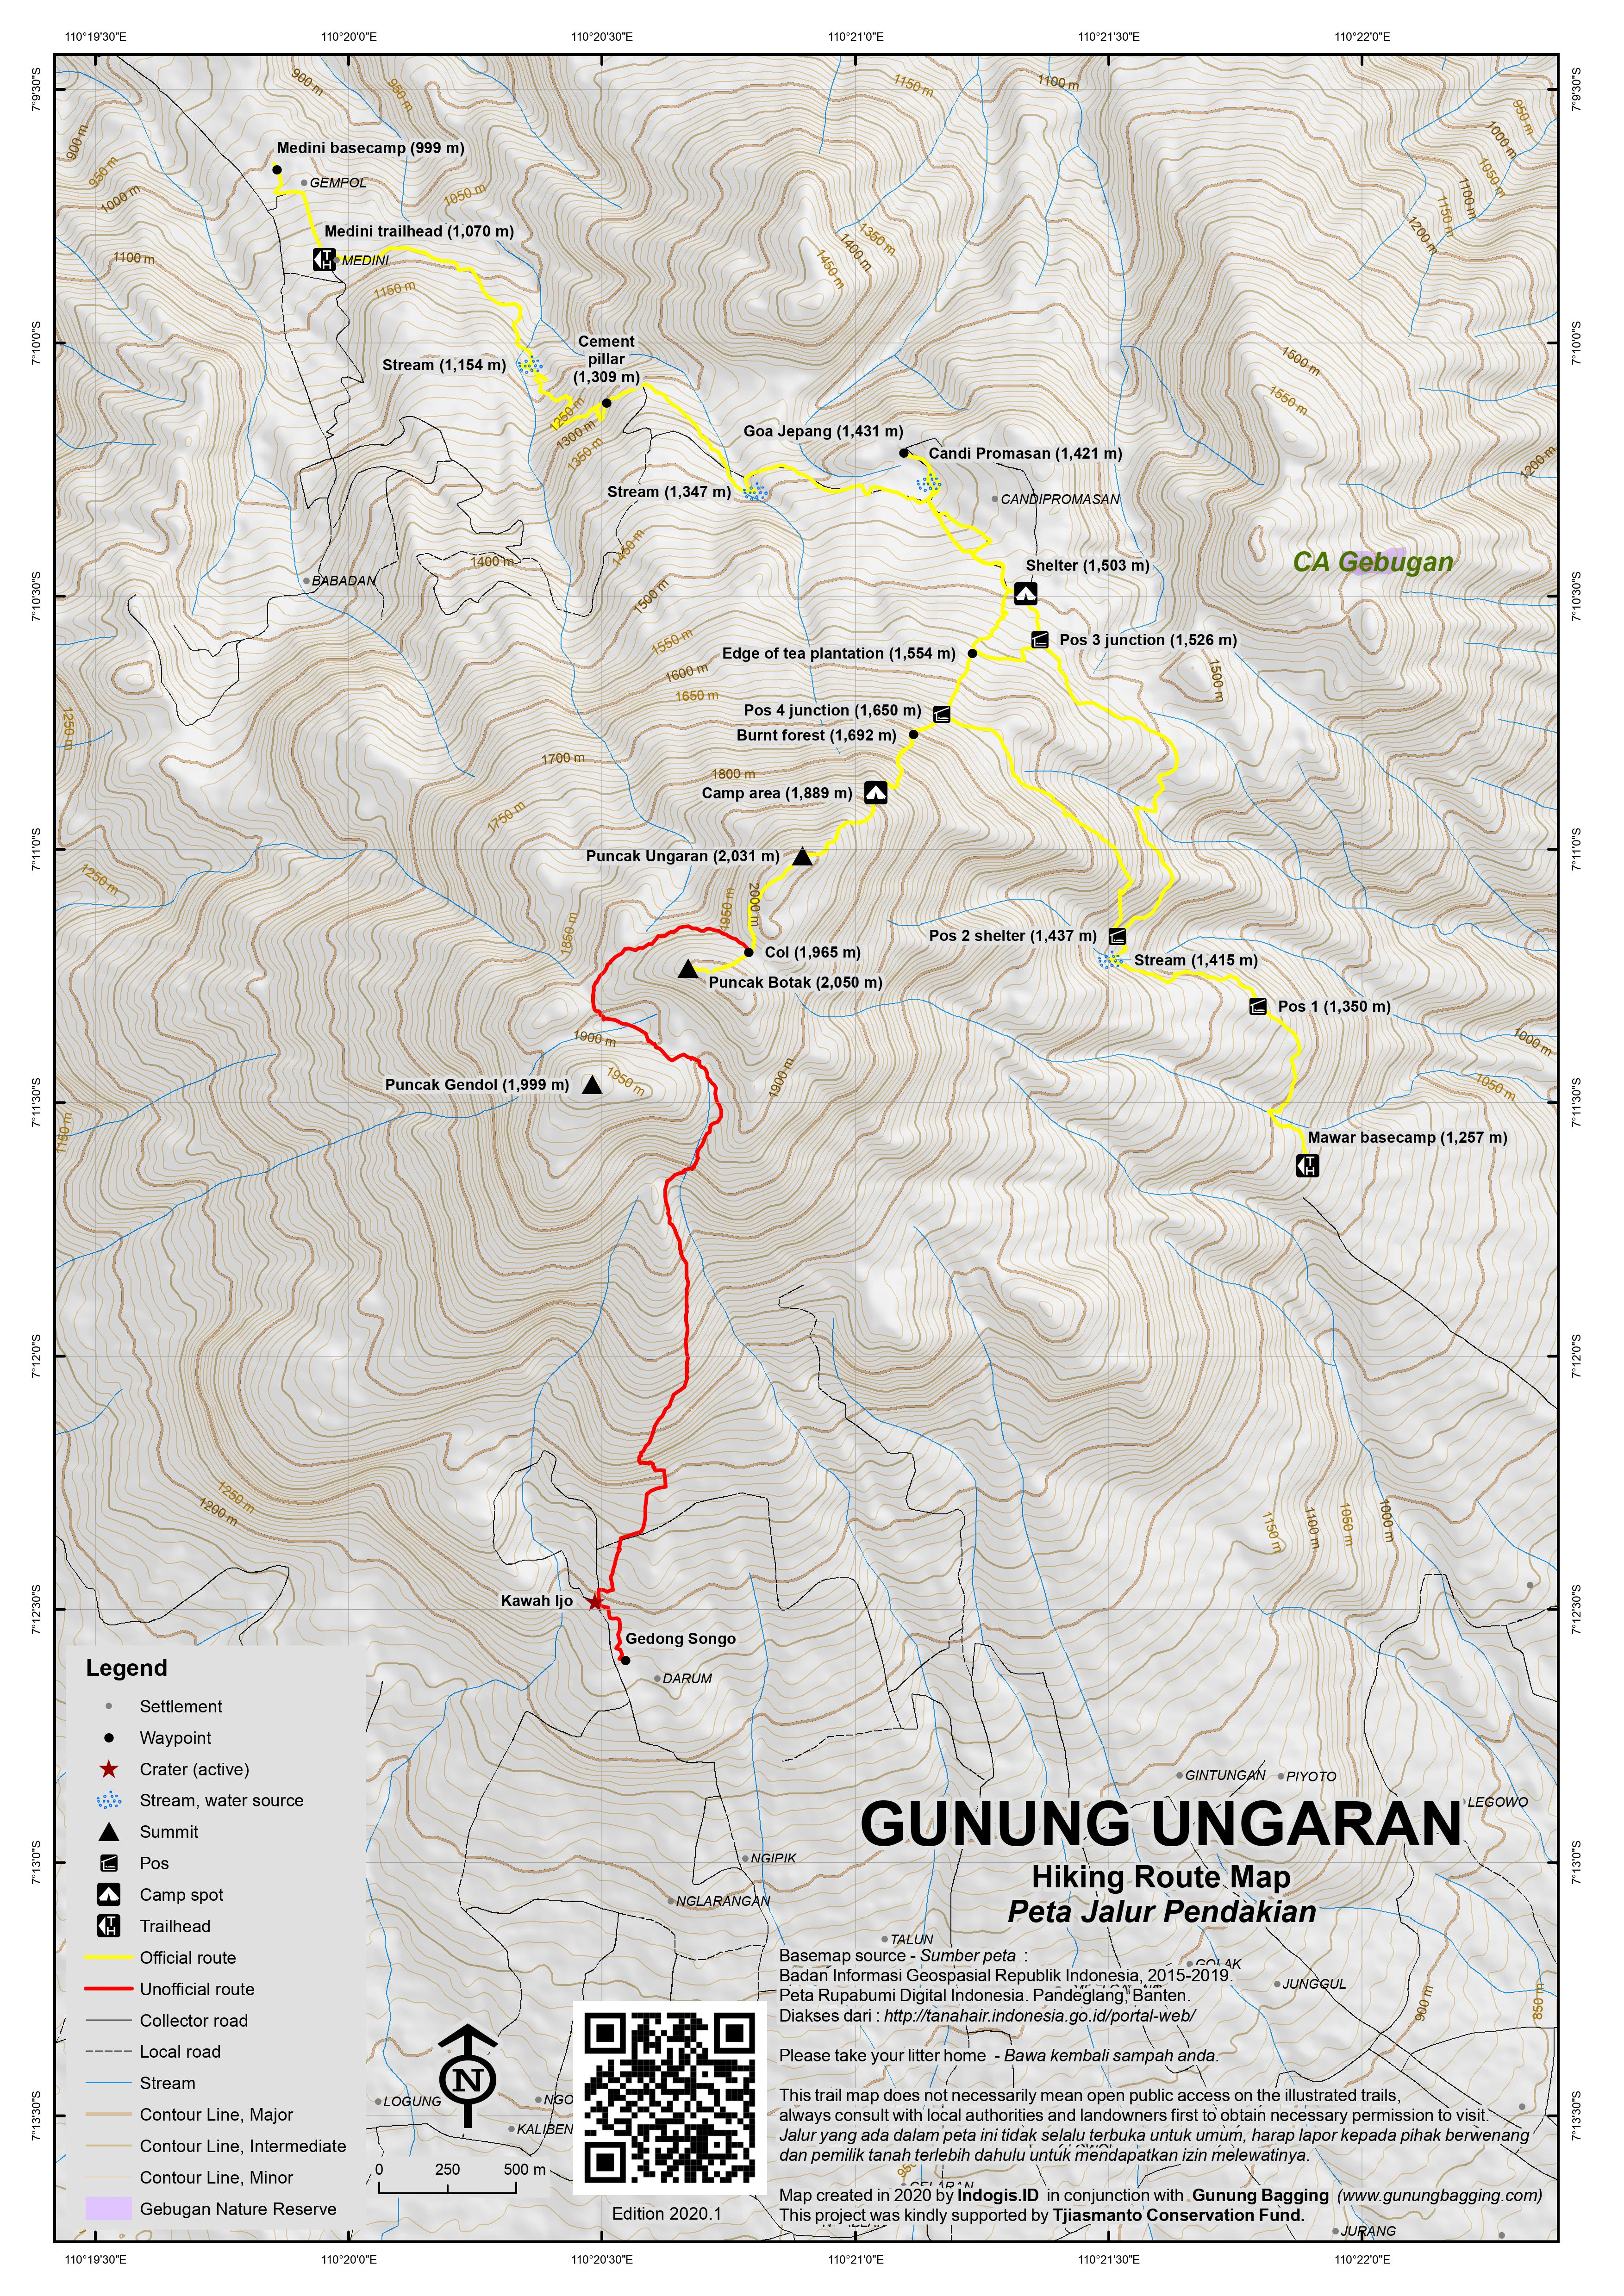 Peta Jalur Pendakian Gunung Ungaran